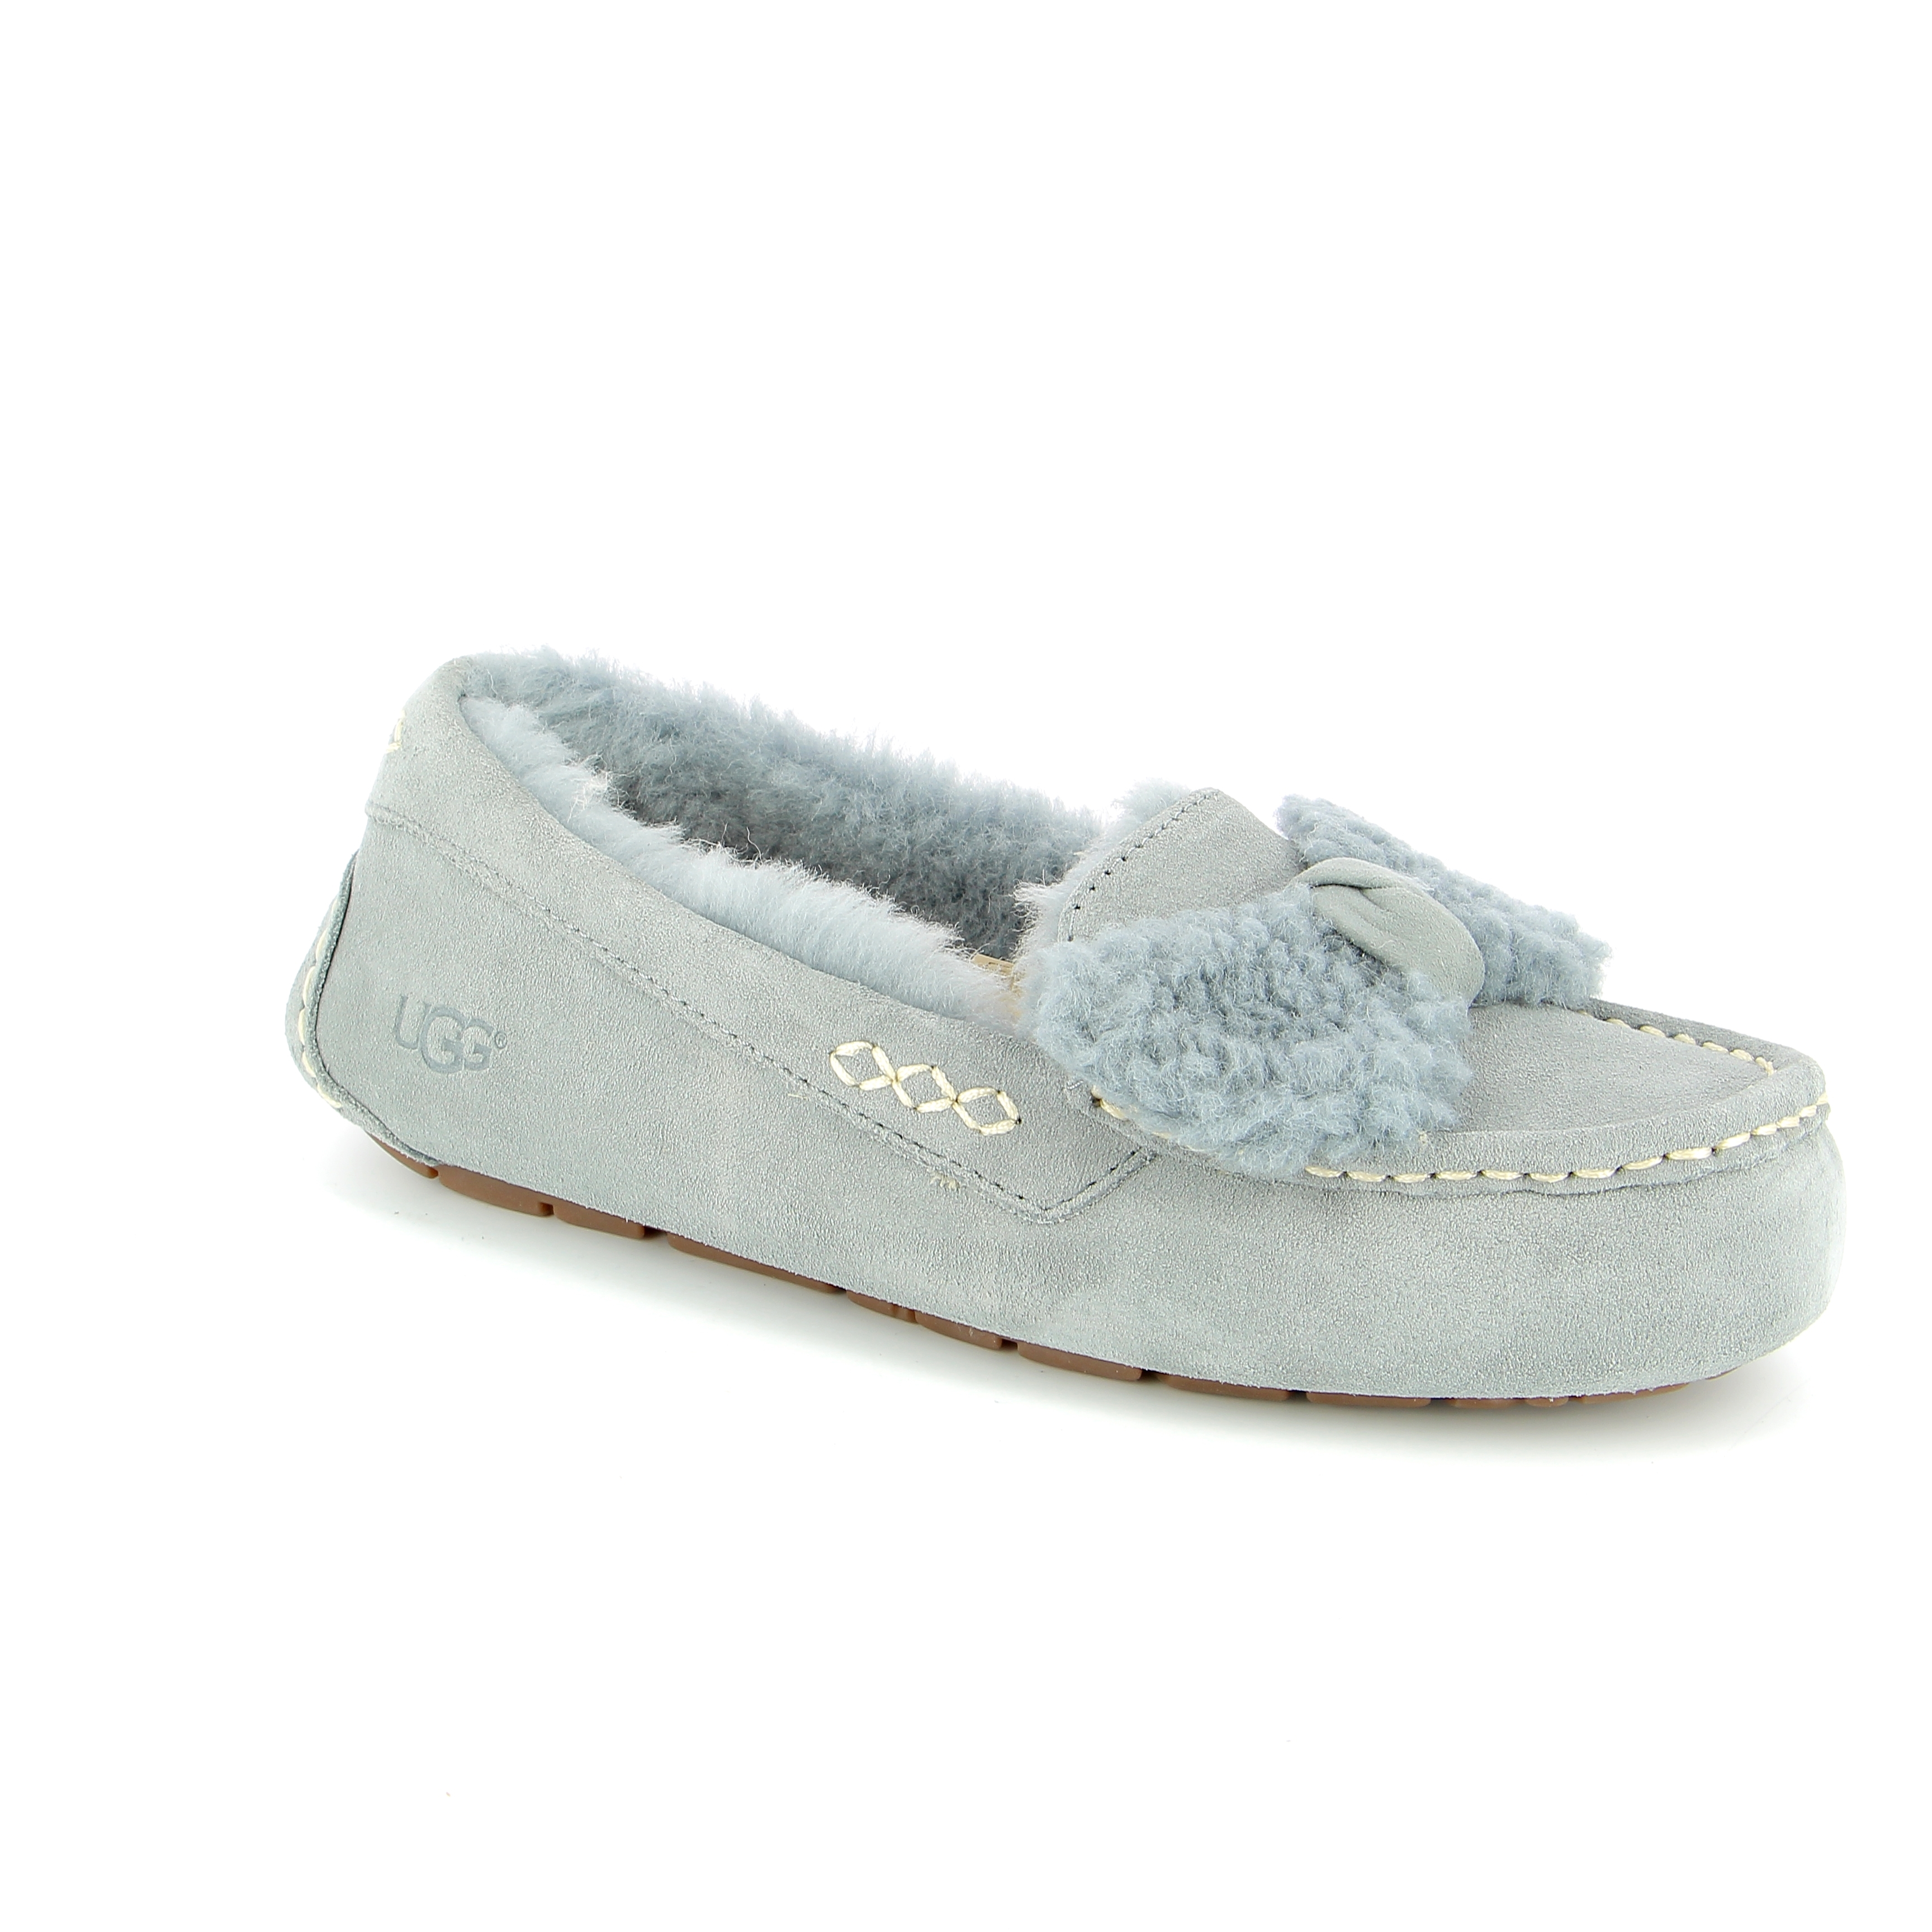 Ugg Pantoffels hemelsblauw